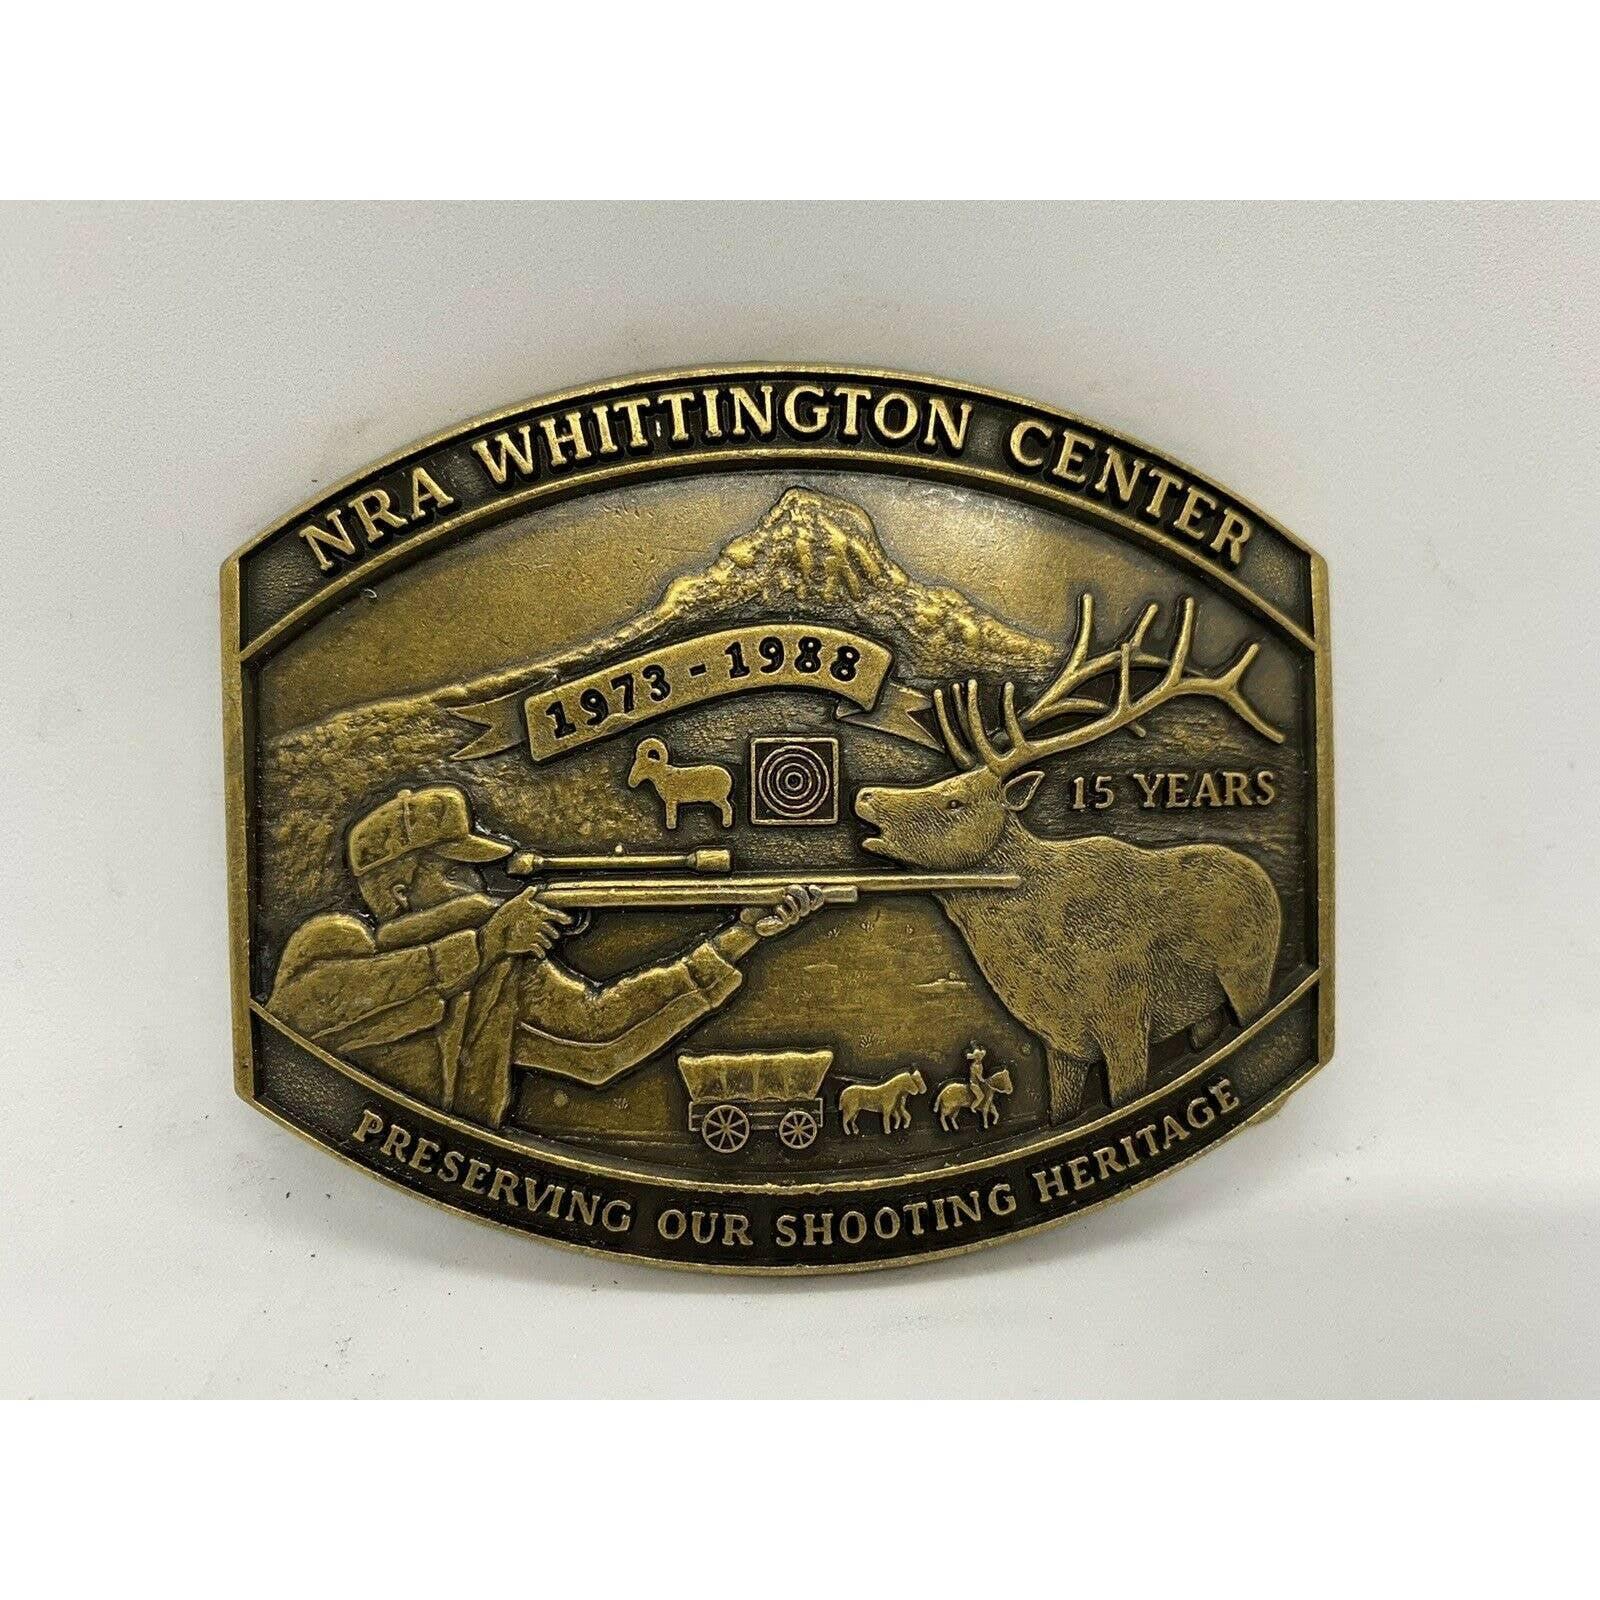 NRA Whittington Center Belt Buckle